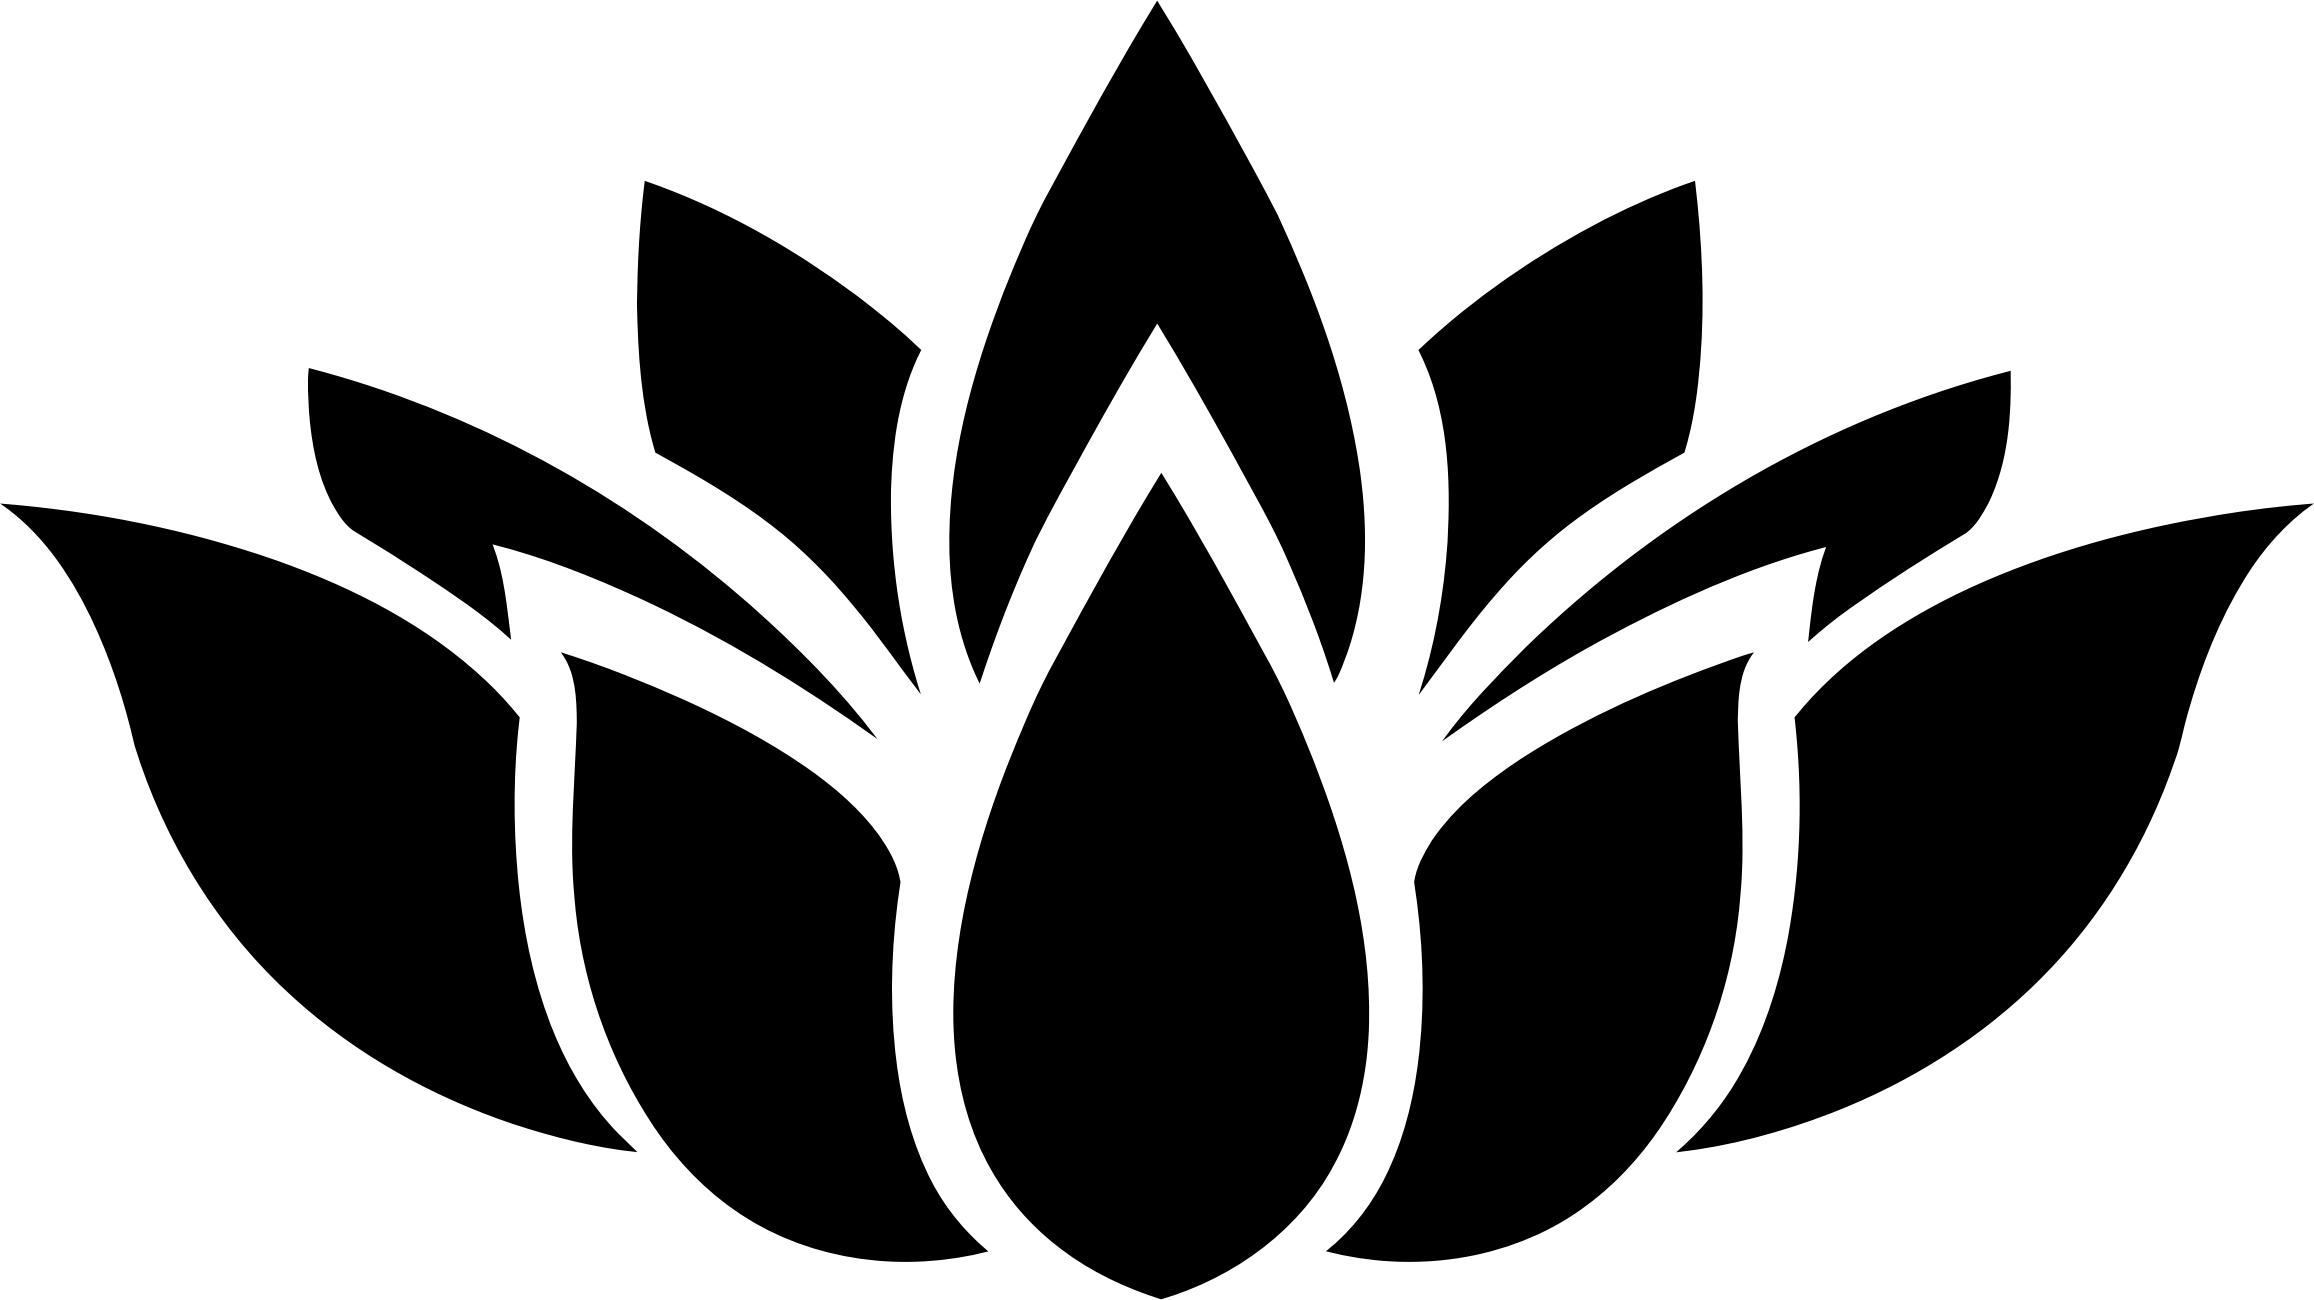 2314x1300 Clipart